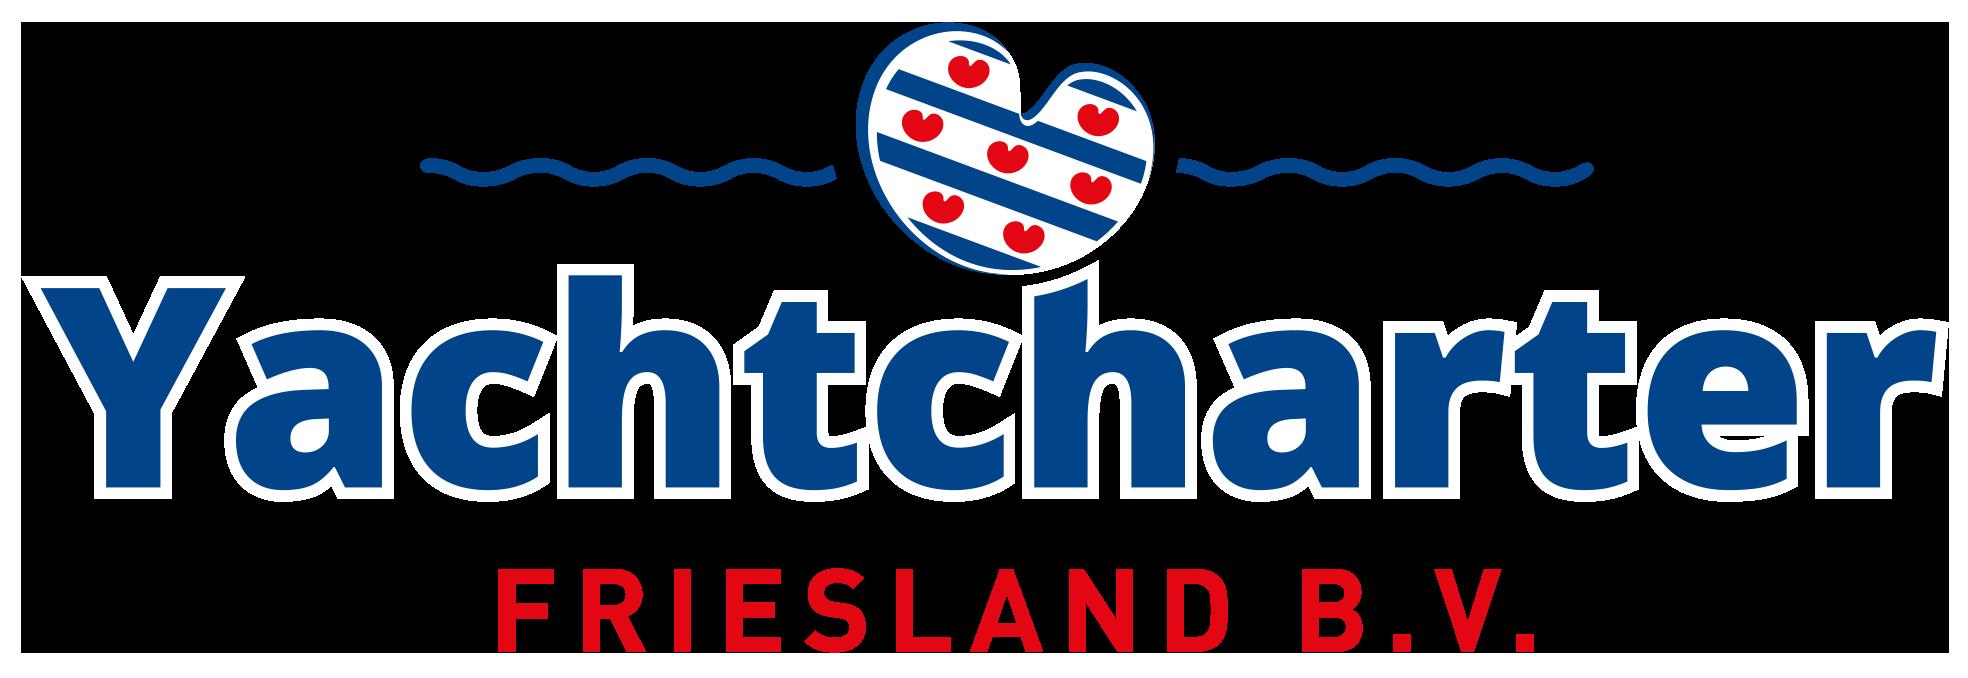 Yachtcharter Friesland B.V.